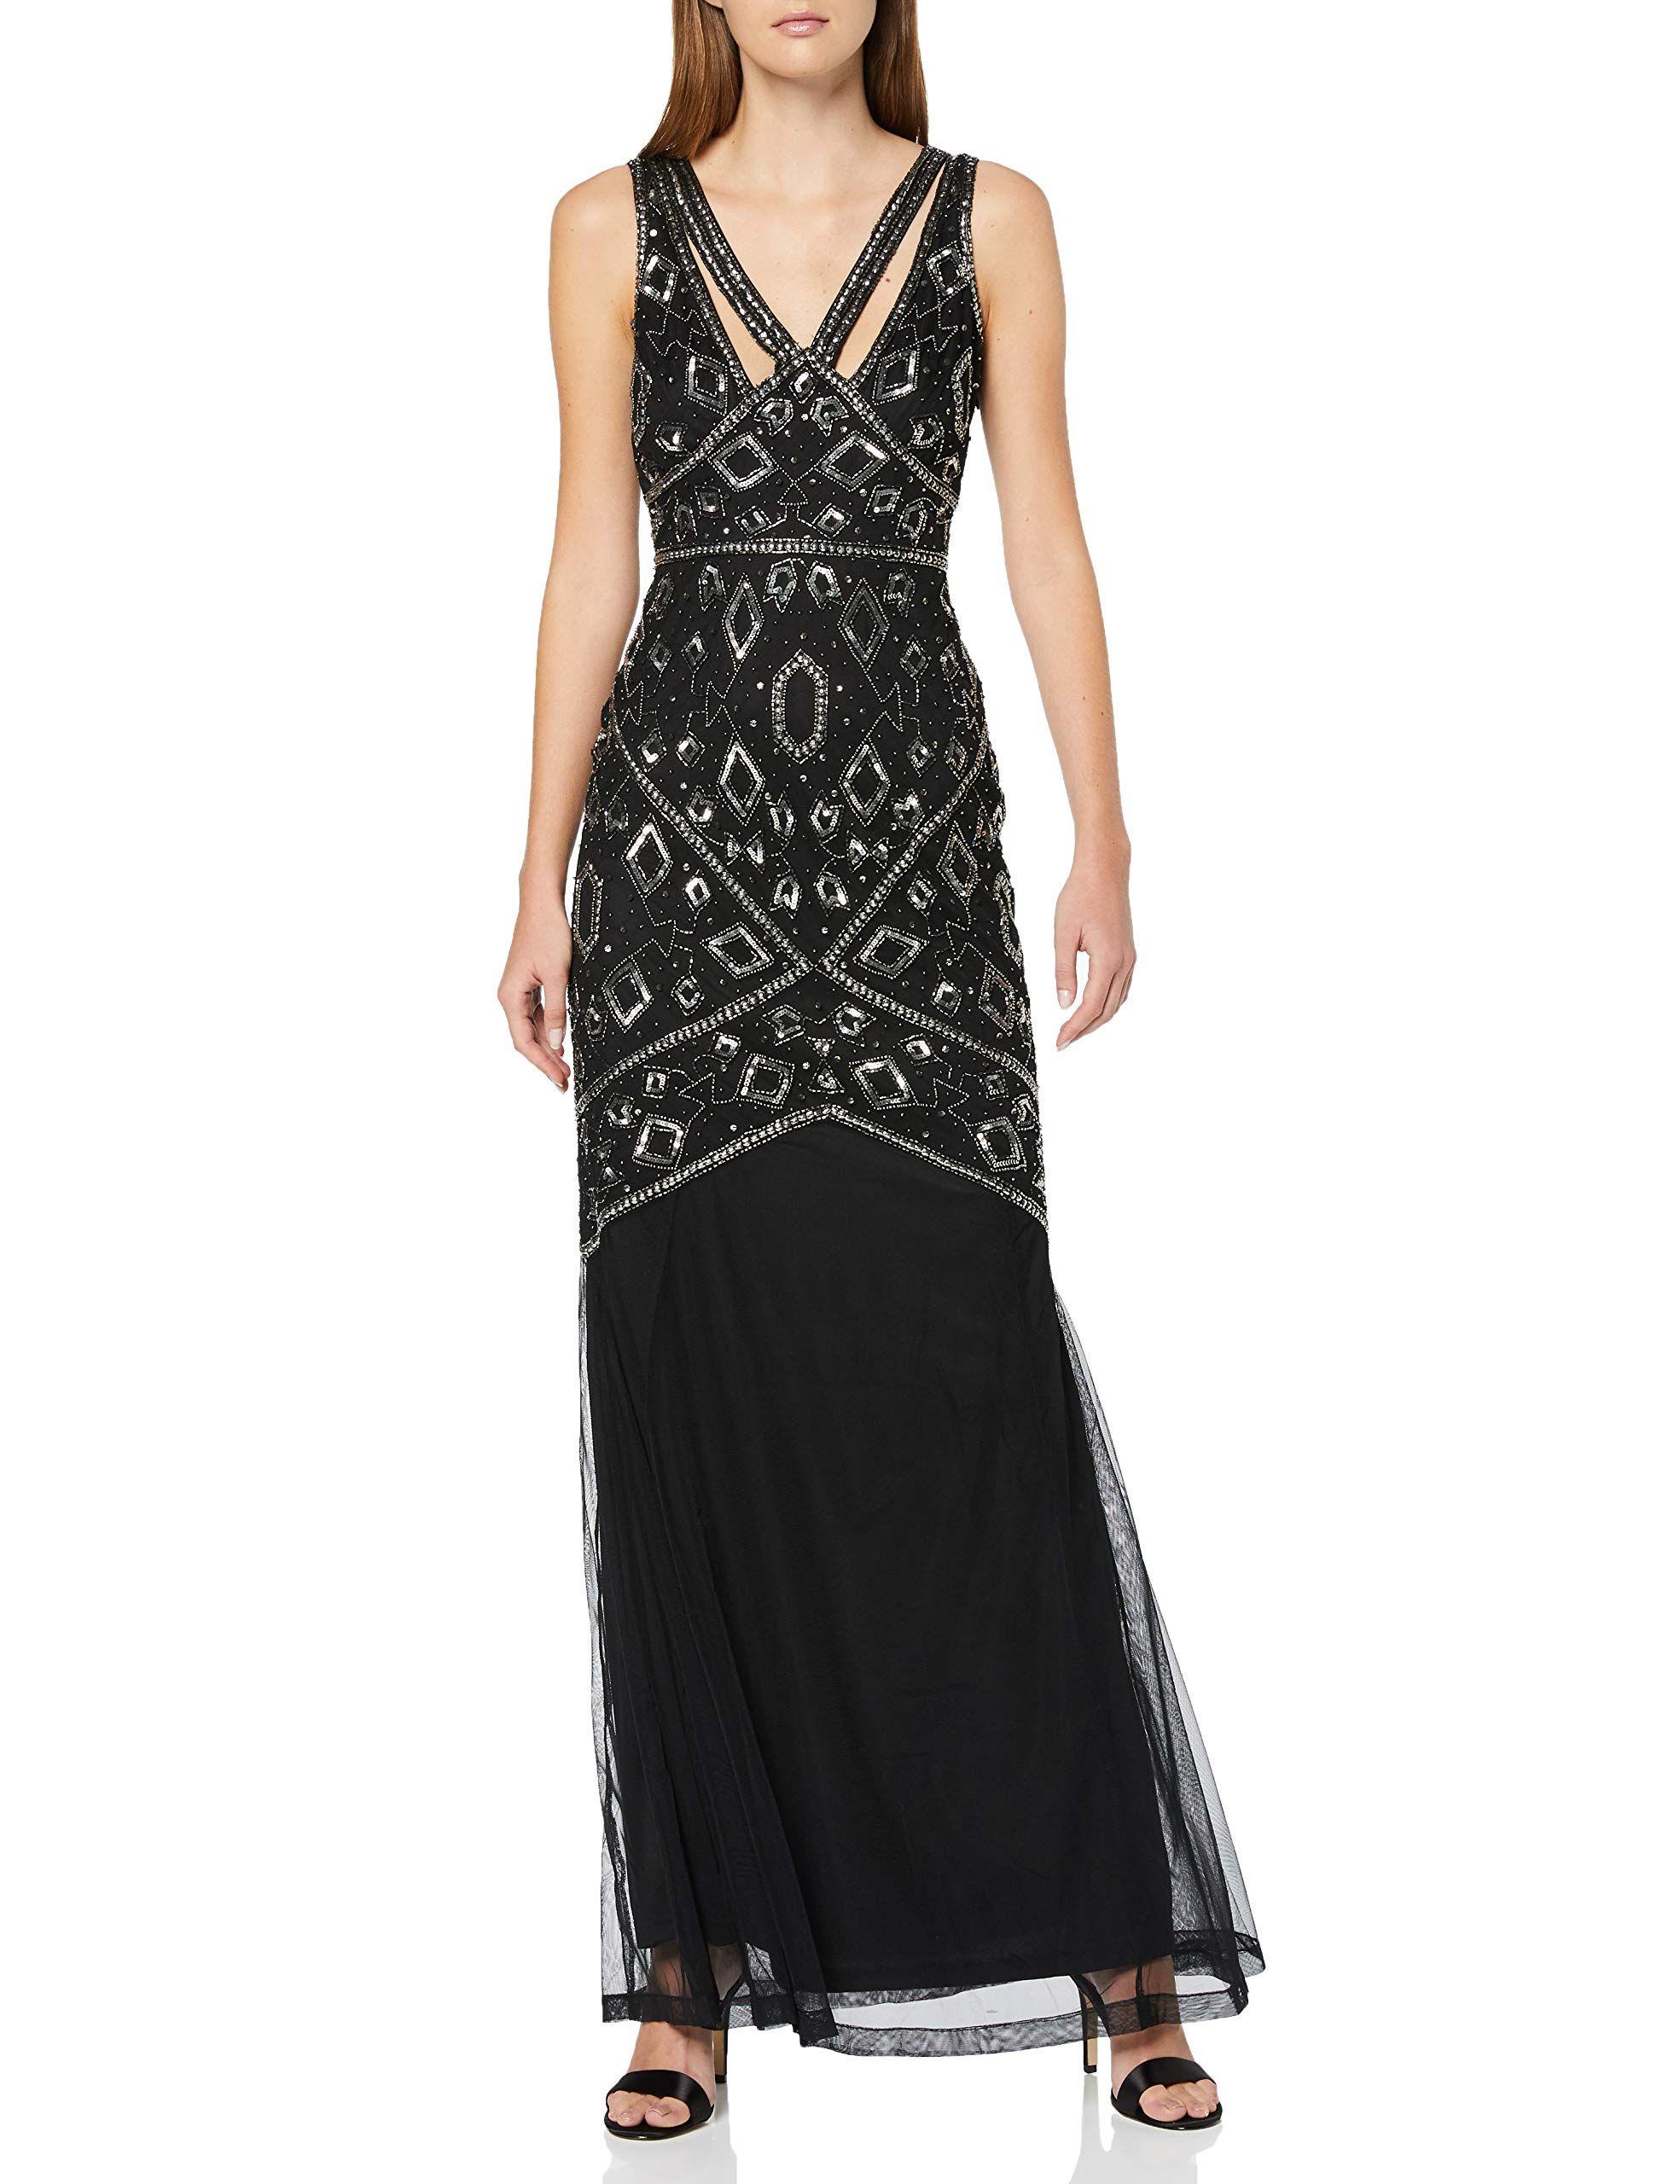 Frock and Frill Henrietta Sleeveless Embellished Maxi Dress Vestito da Sera Donna